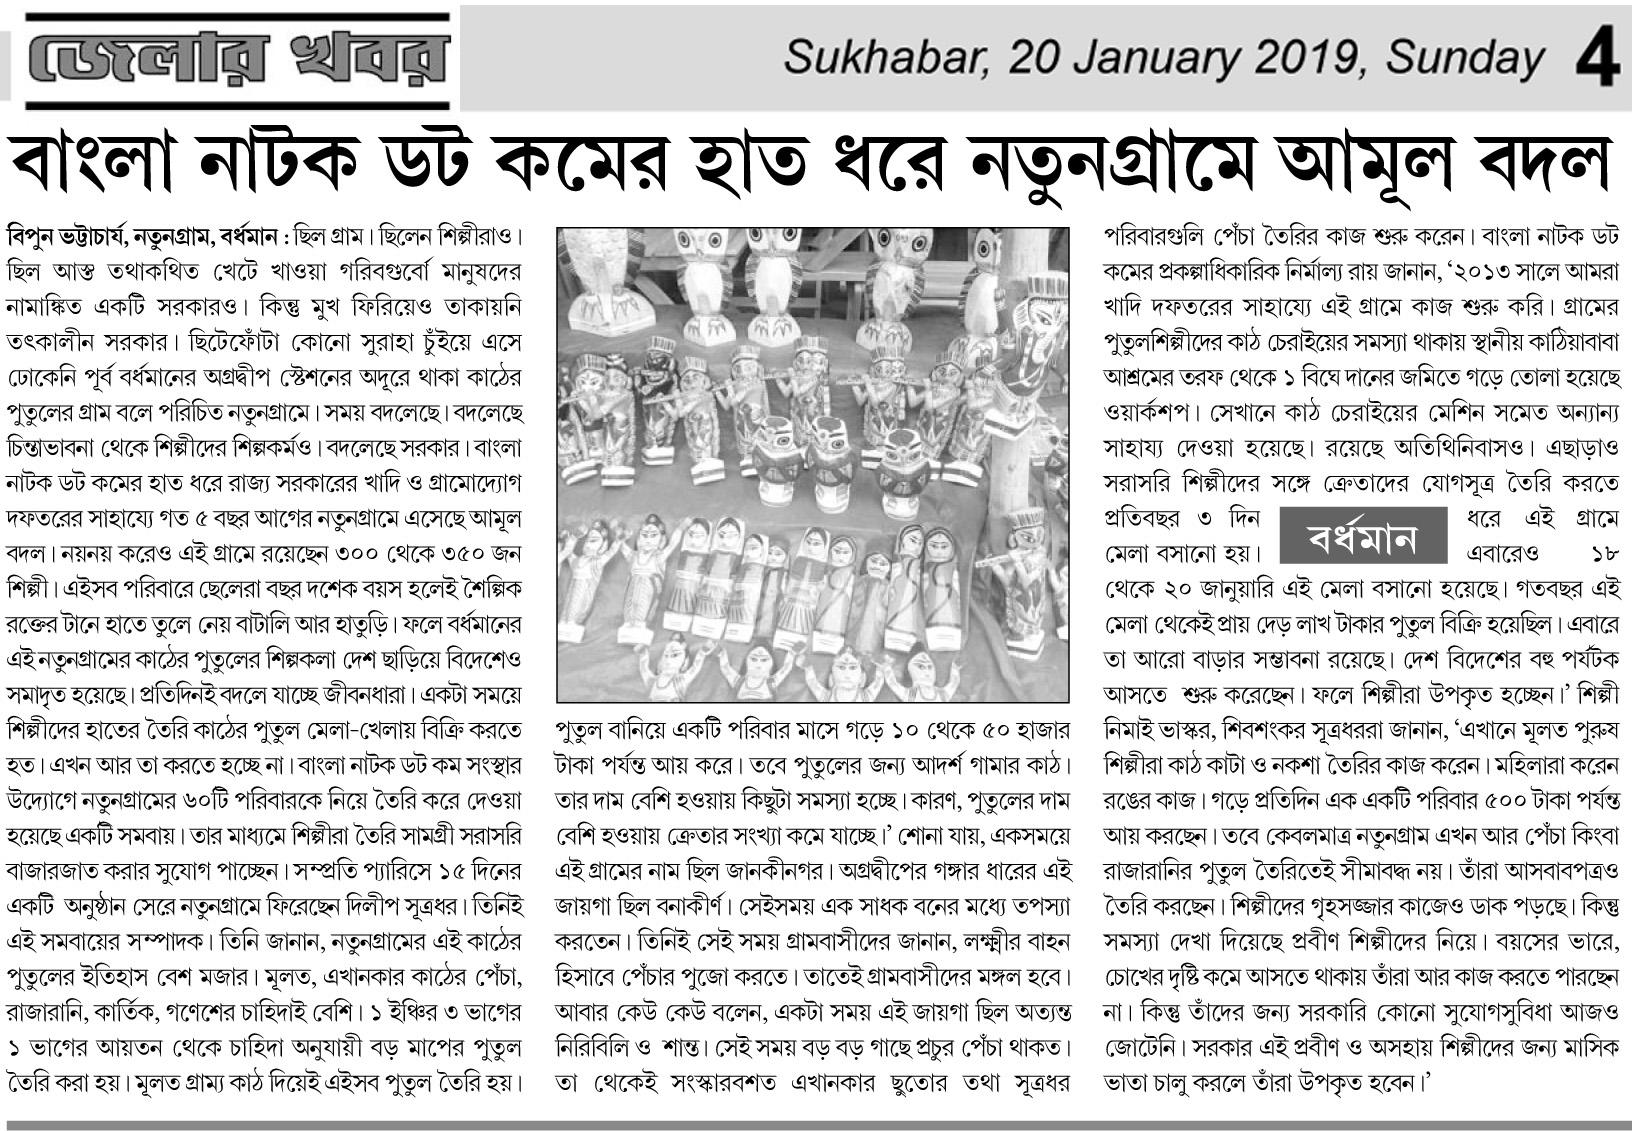 News clippings of Wooden Doll Mela 2019 at Natungram_Sukhabar 20 January 2019